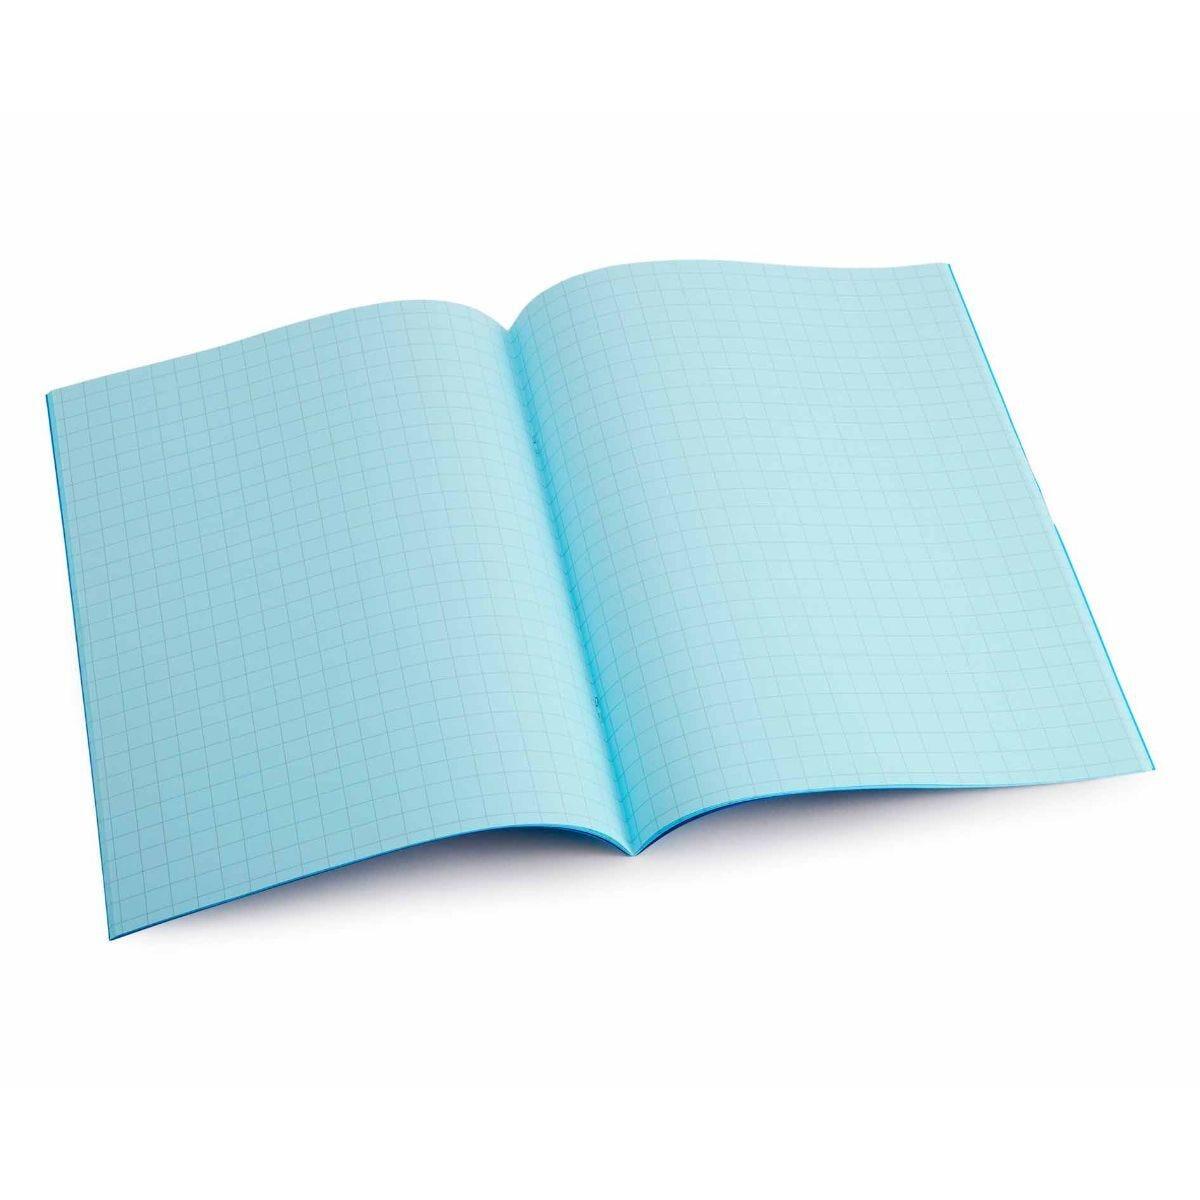 Tinted Exercise Books Squared A4 10mm Aqua